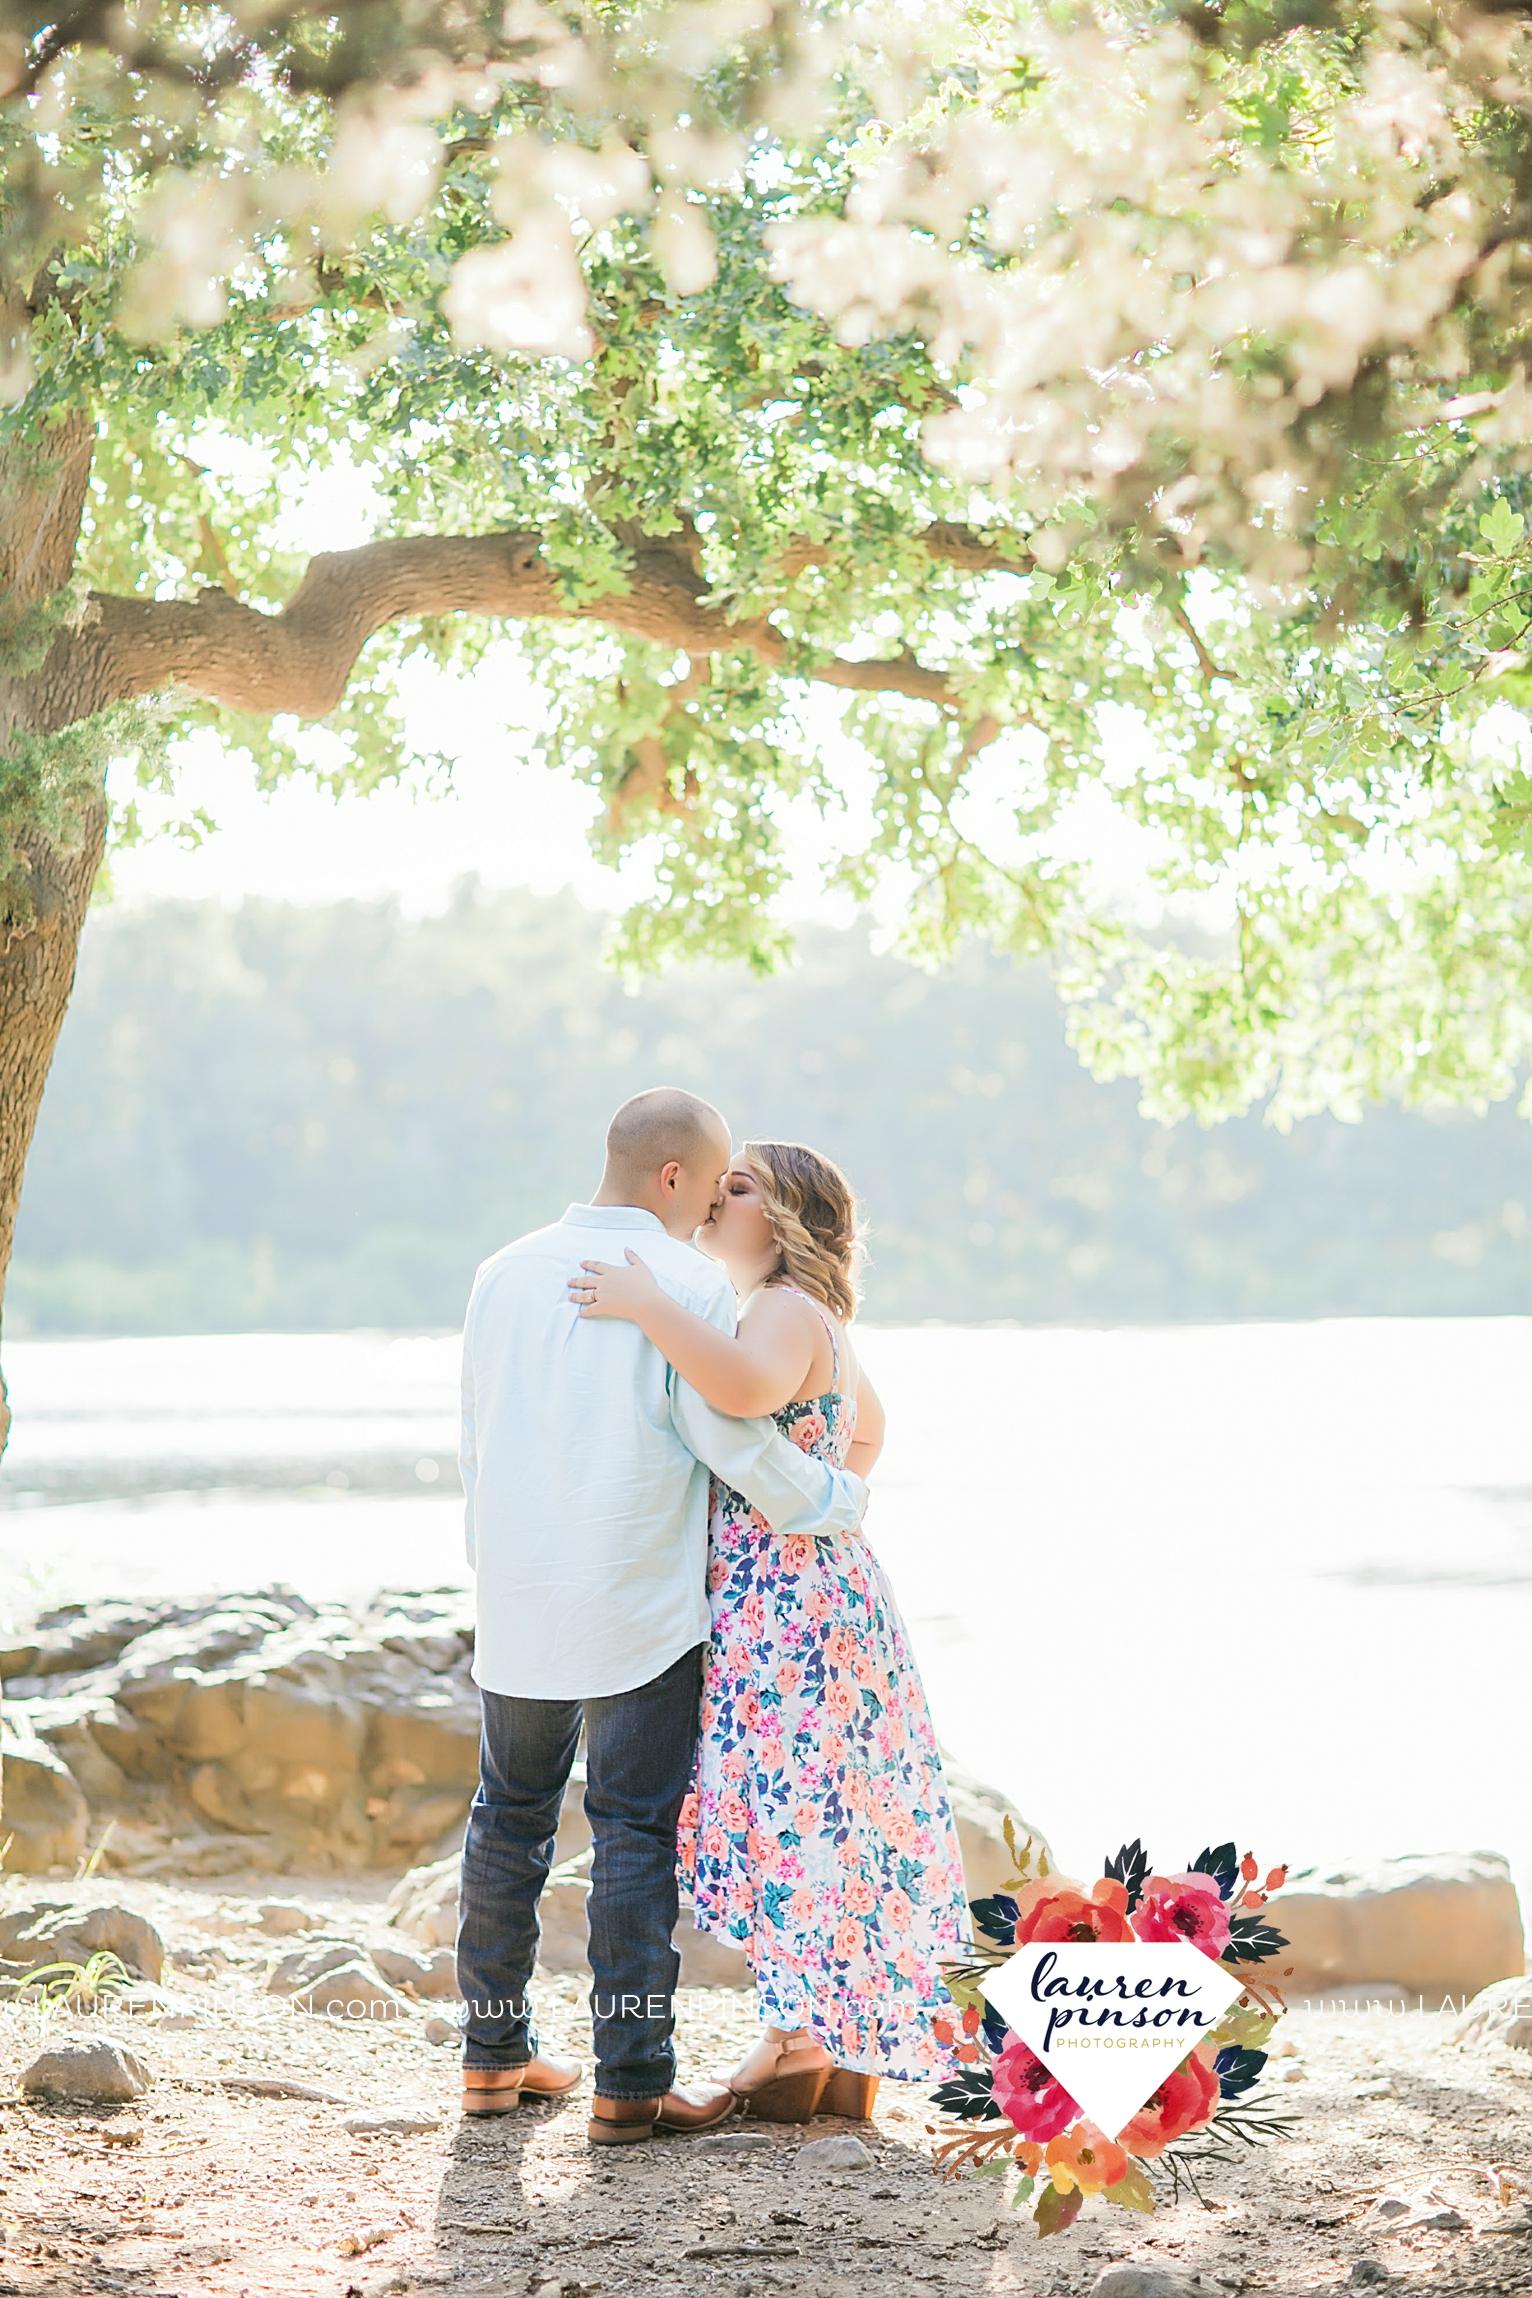 wichita-falls-texas-wedding-photography-engagement-session-army-fort-sill-lawton-oklahoma-wichita-mountains-newlyweds-00001.jpg